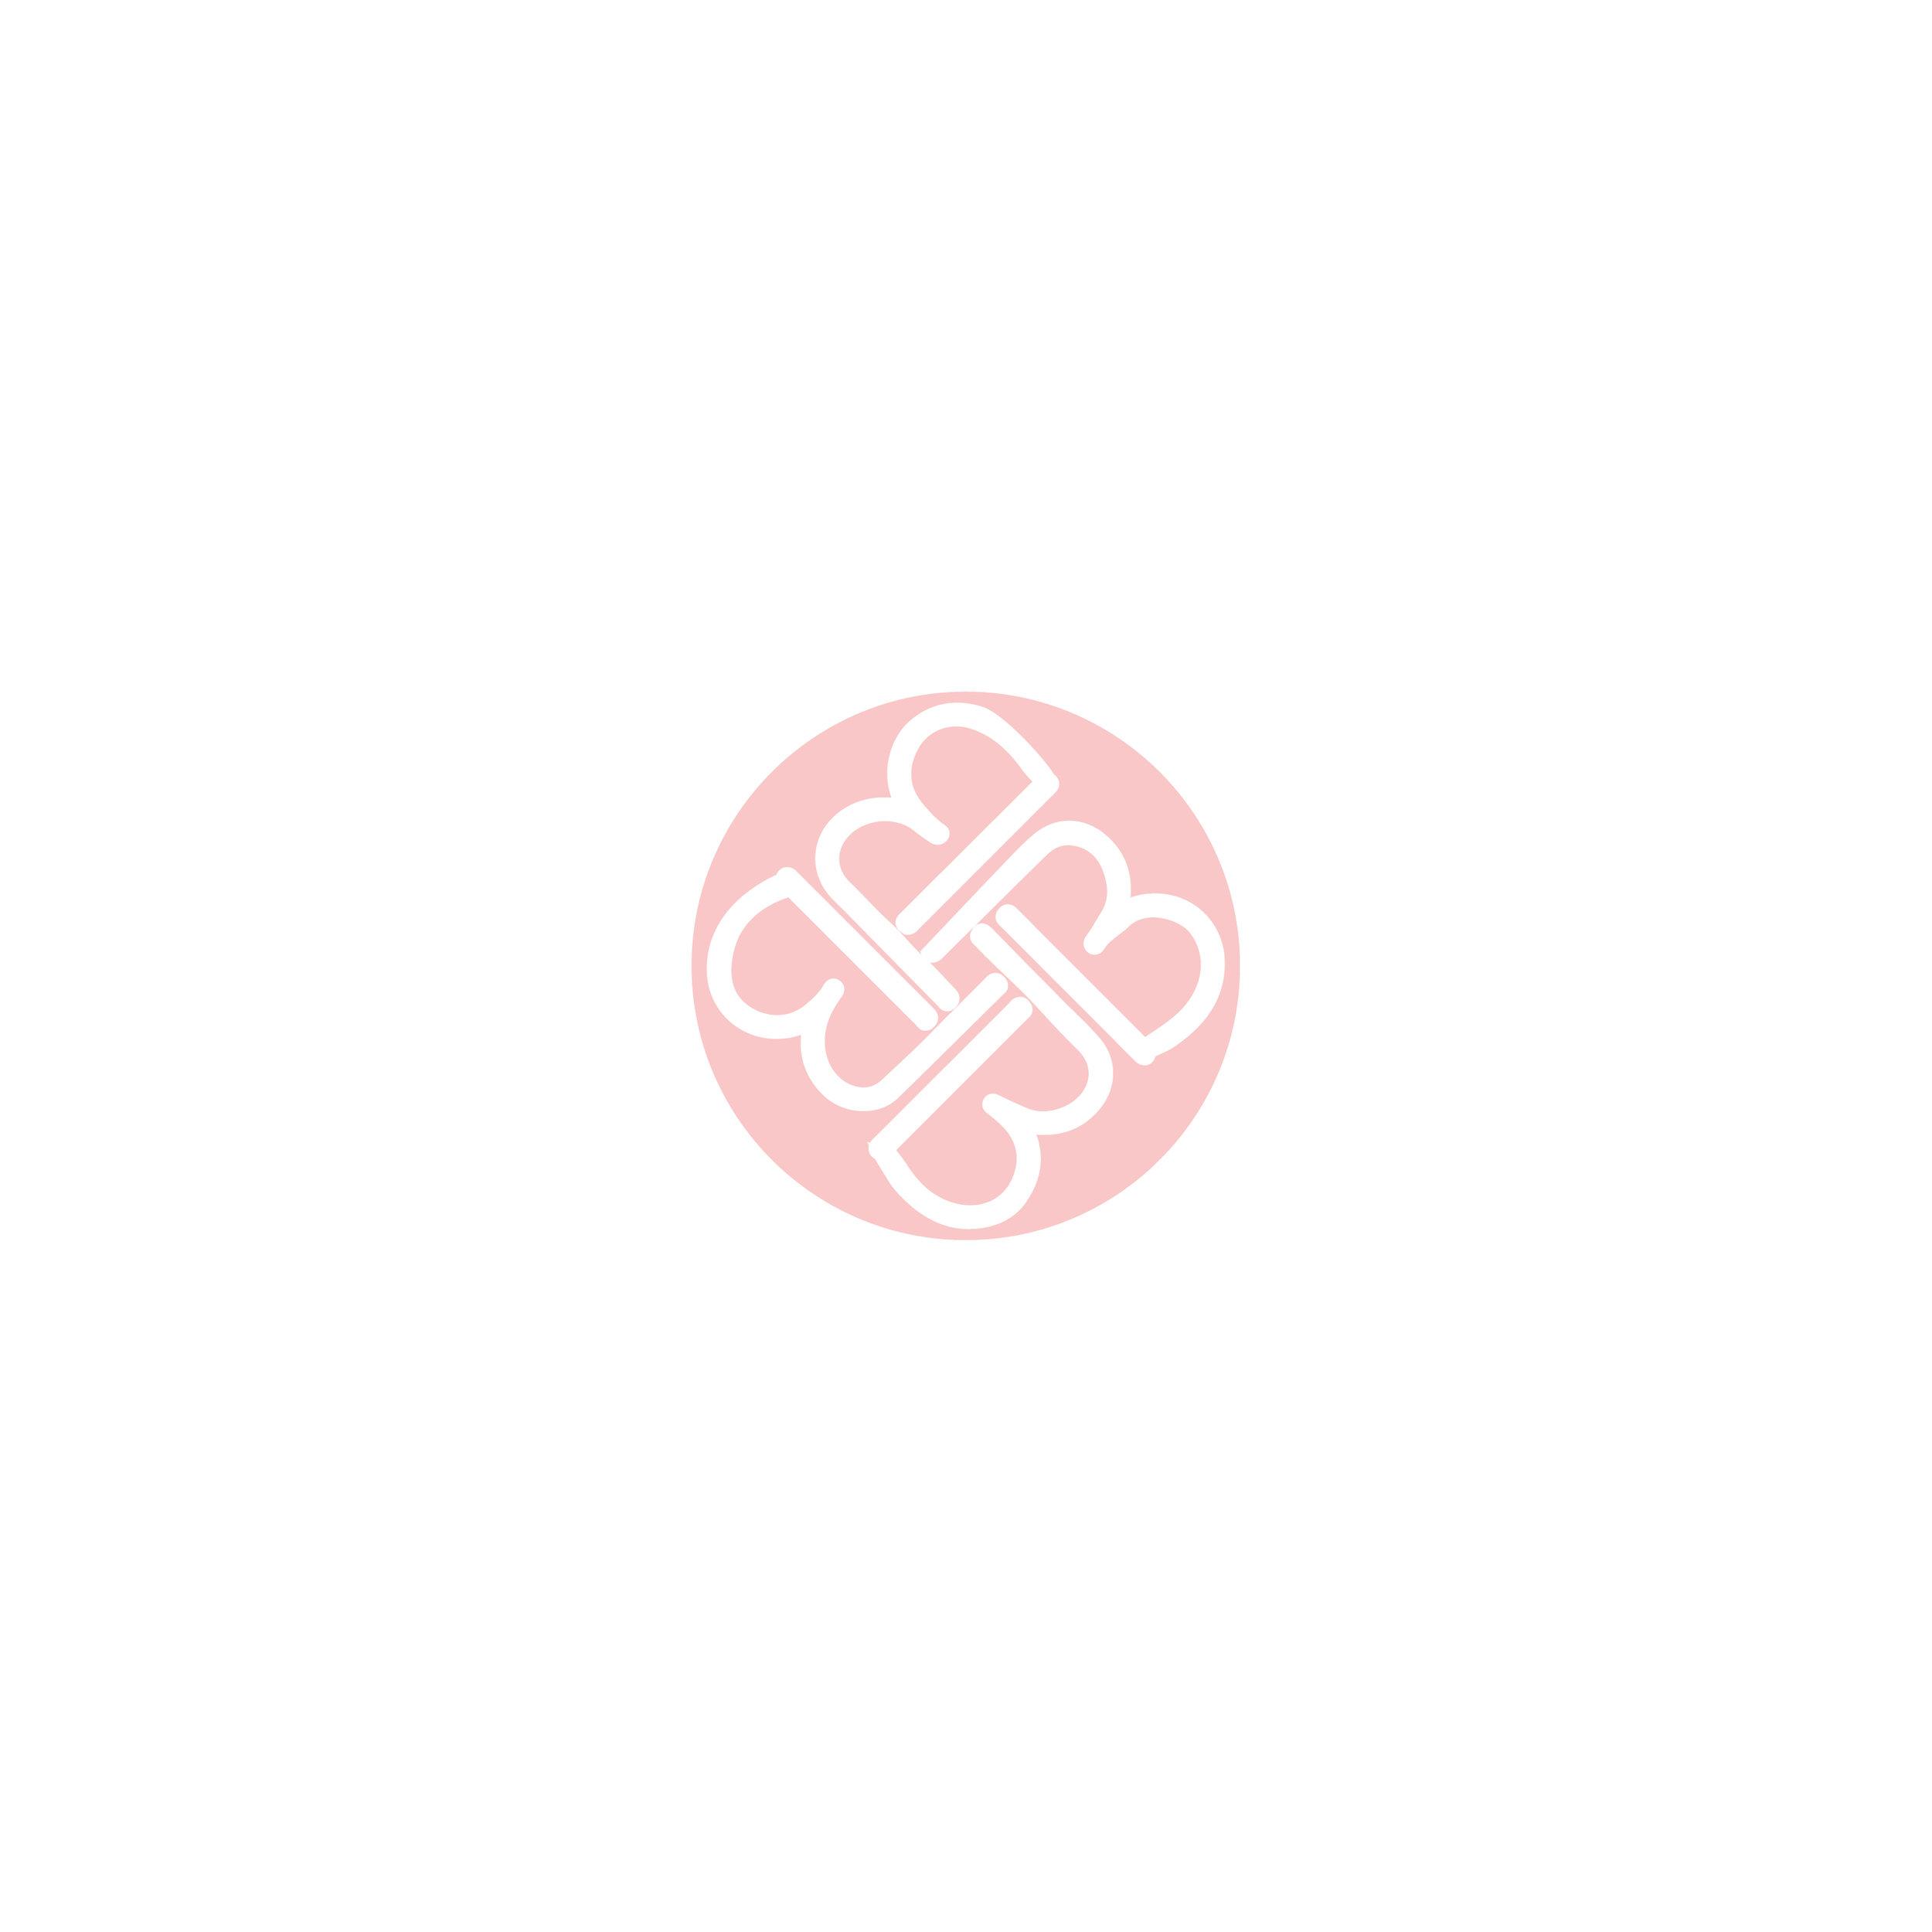 Blush Emblem Circle - for social feed copy 3.jpg